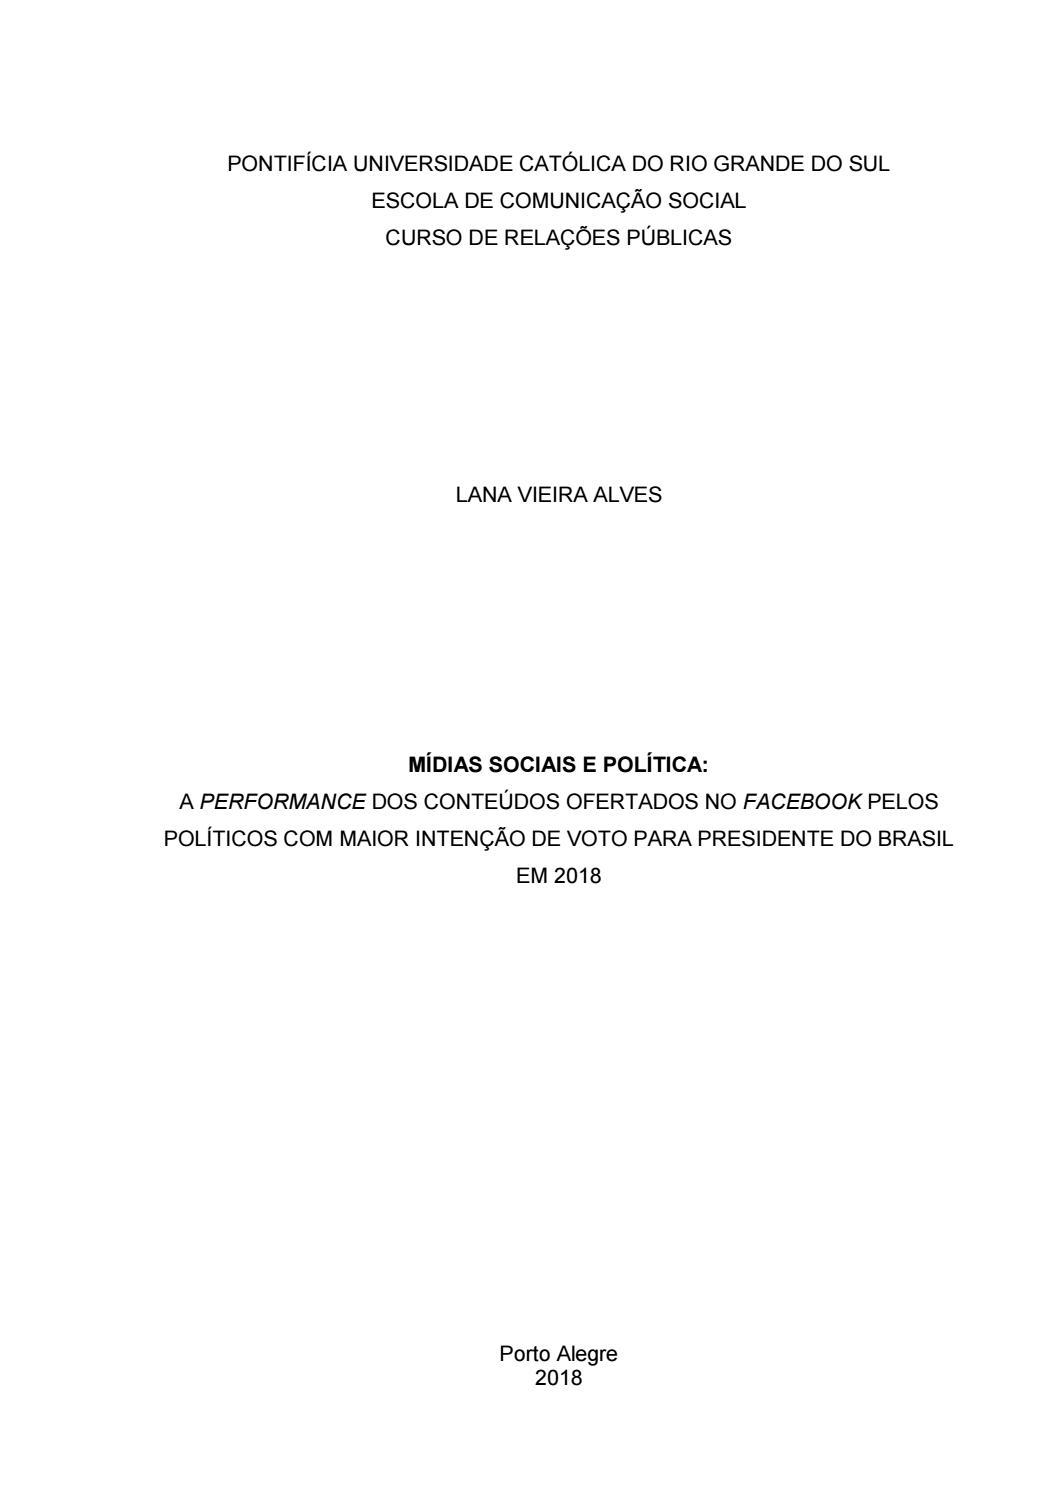 Mídias Sociais E Política By Lanavieiraalves Issuu